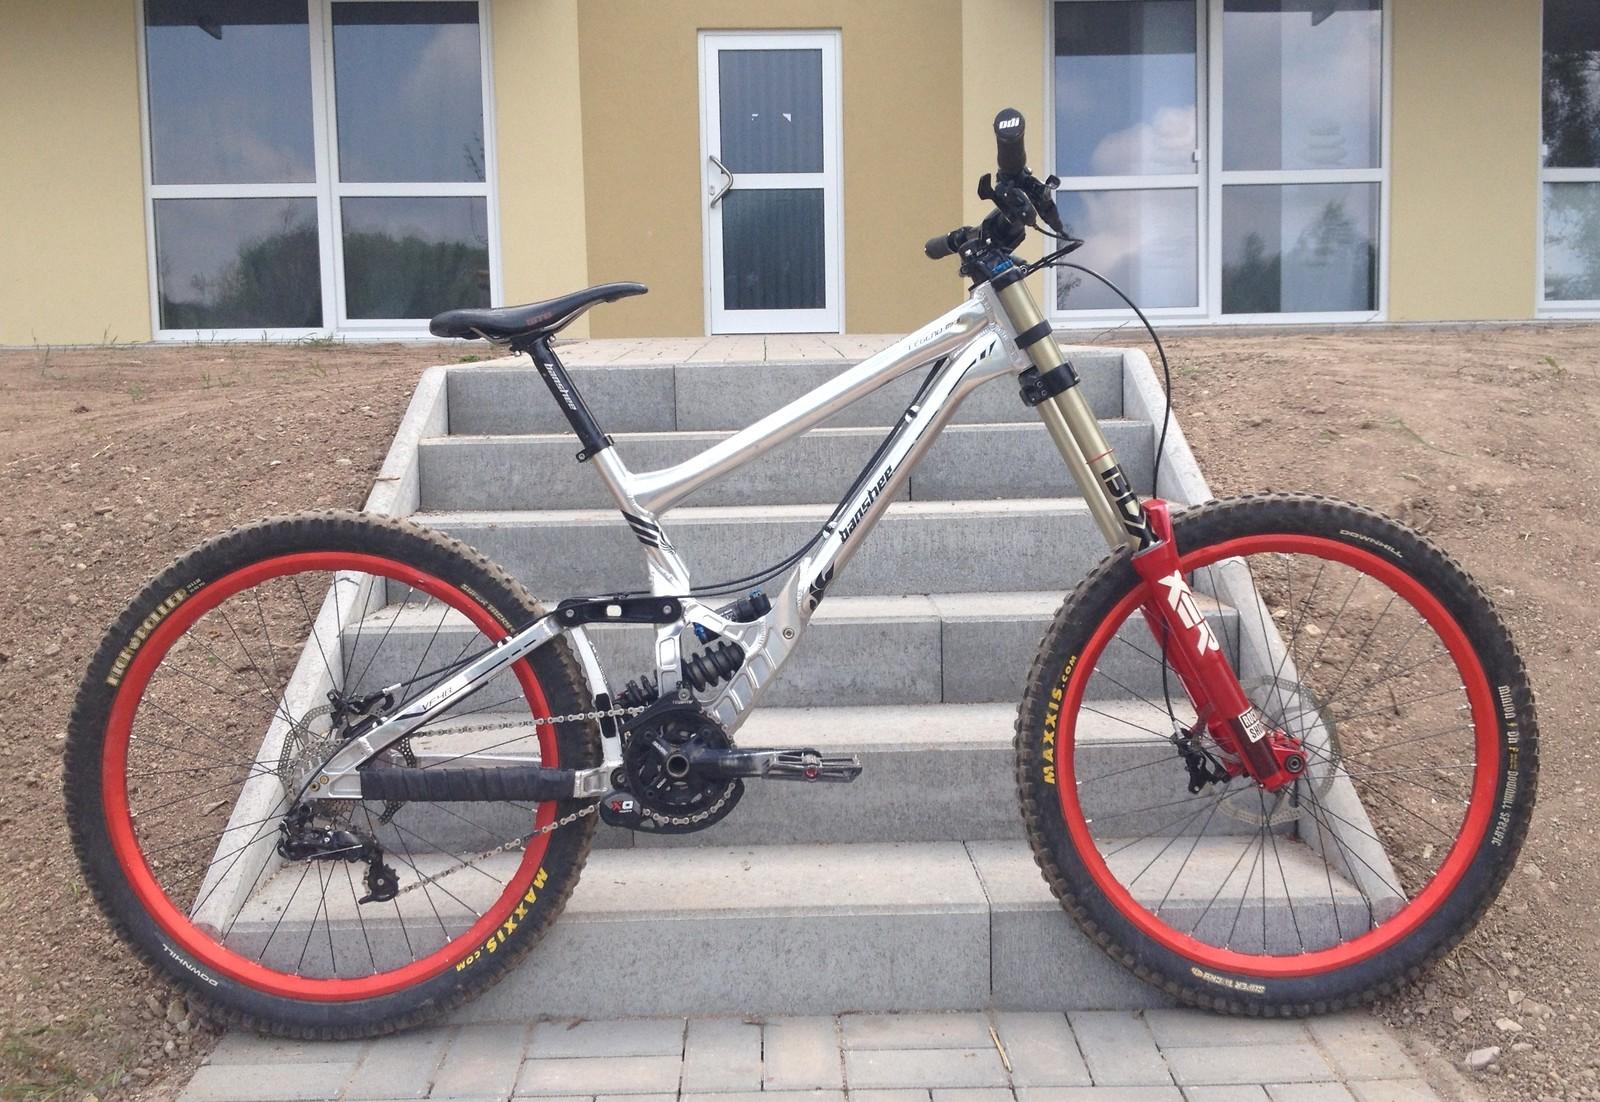 2014 Bike, it got BOD on Vital like this.